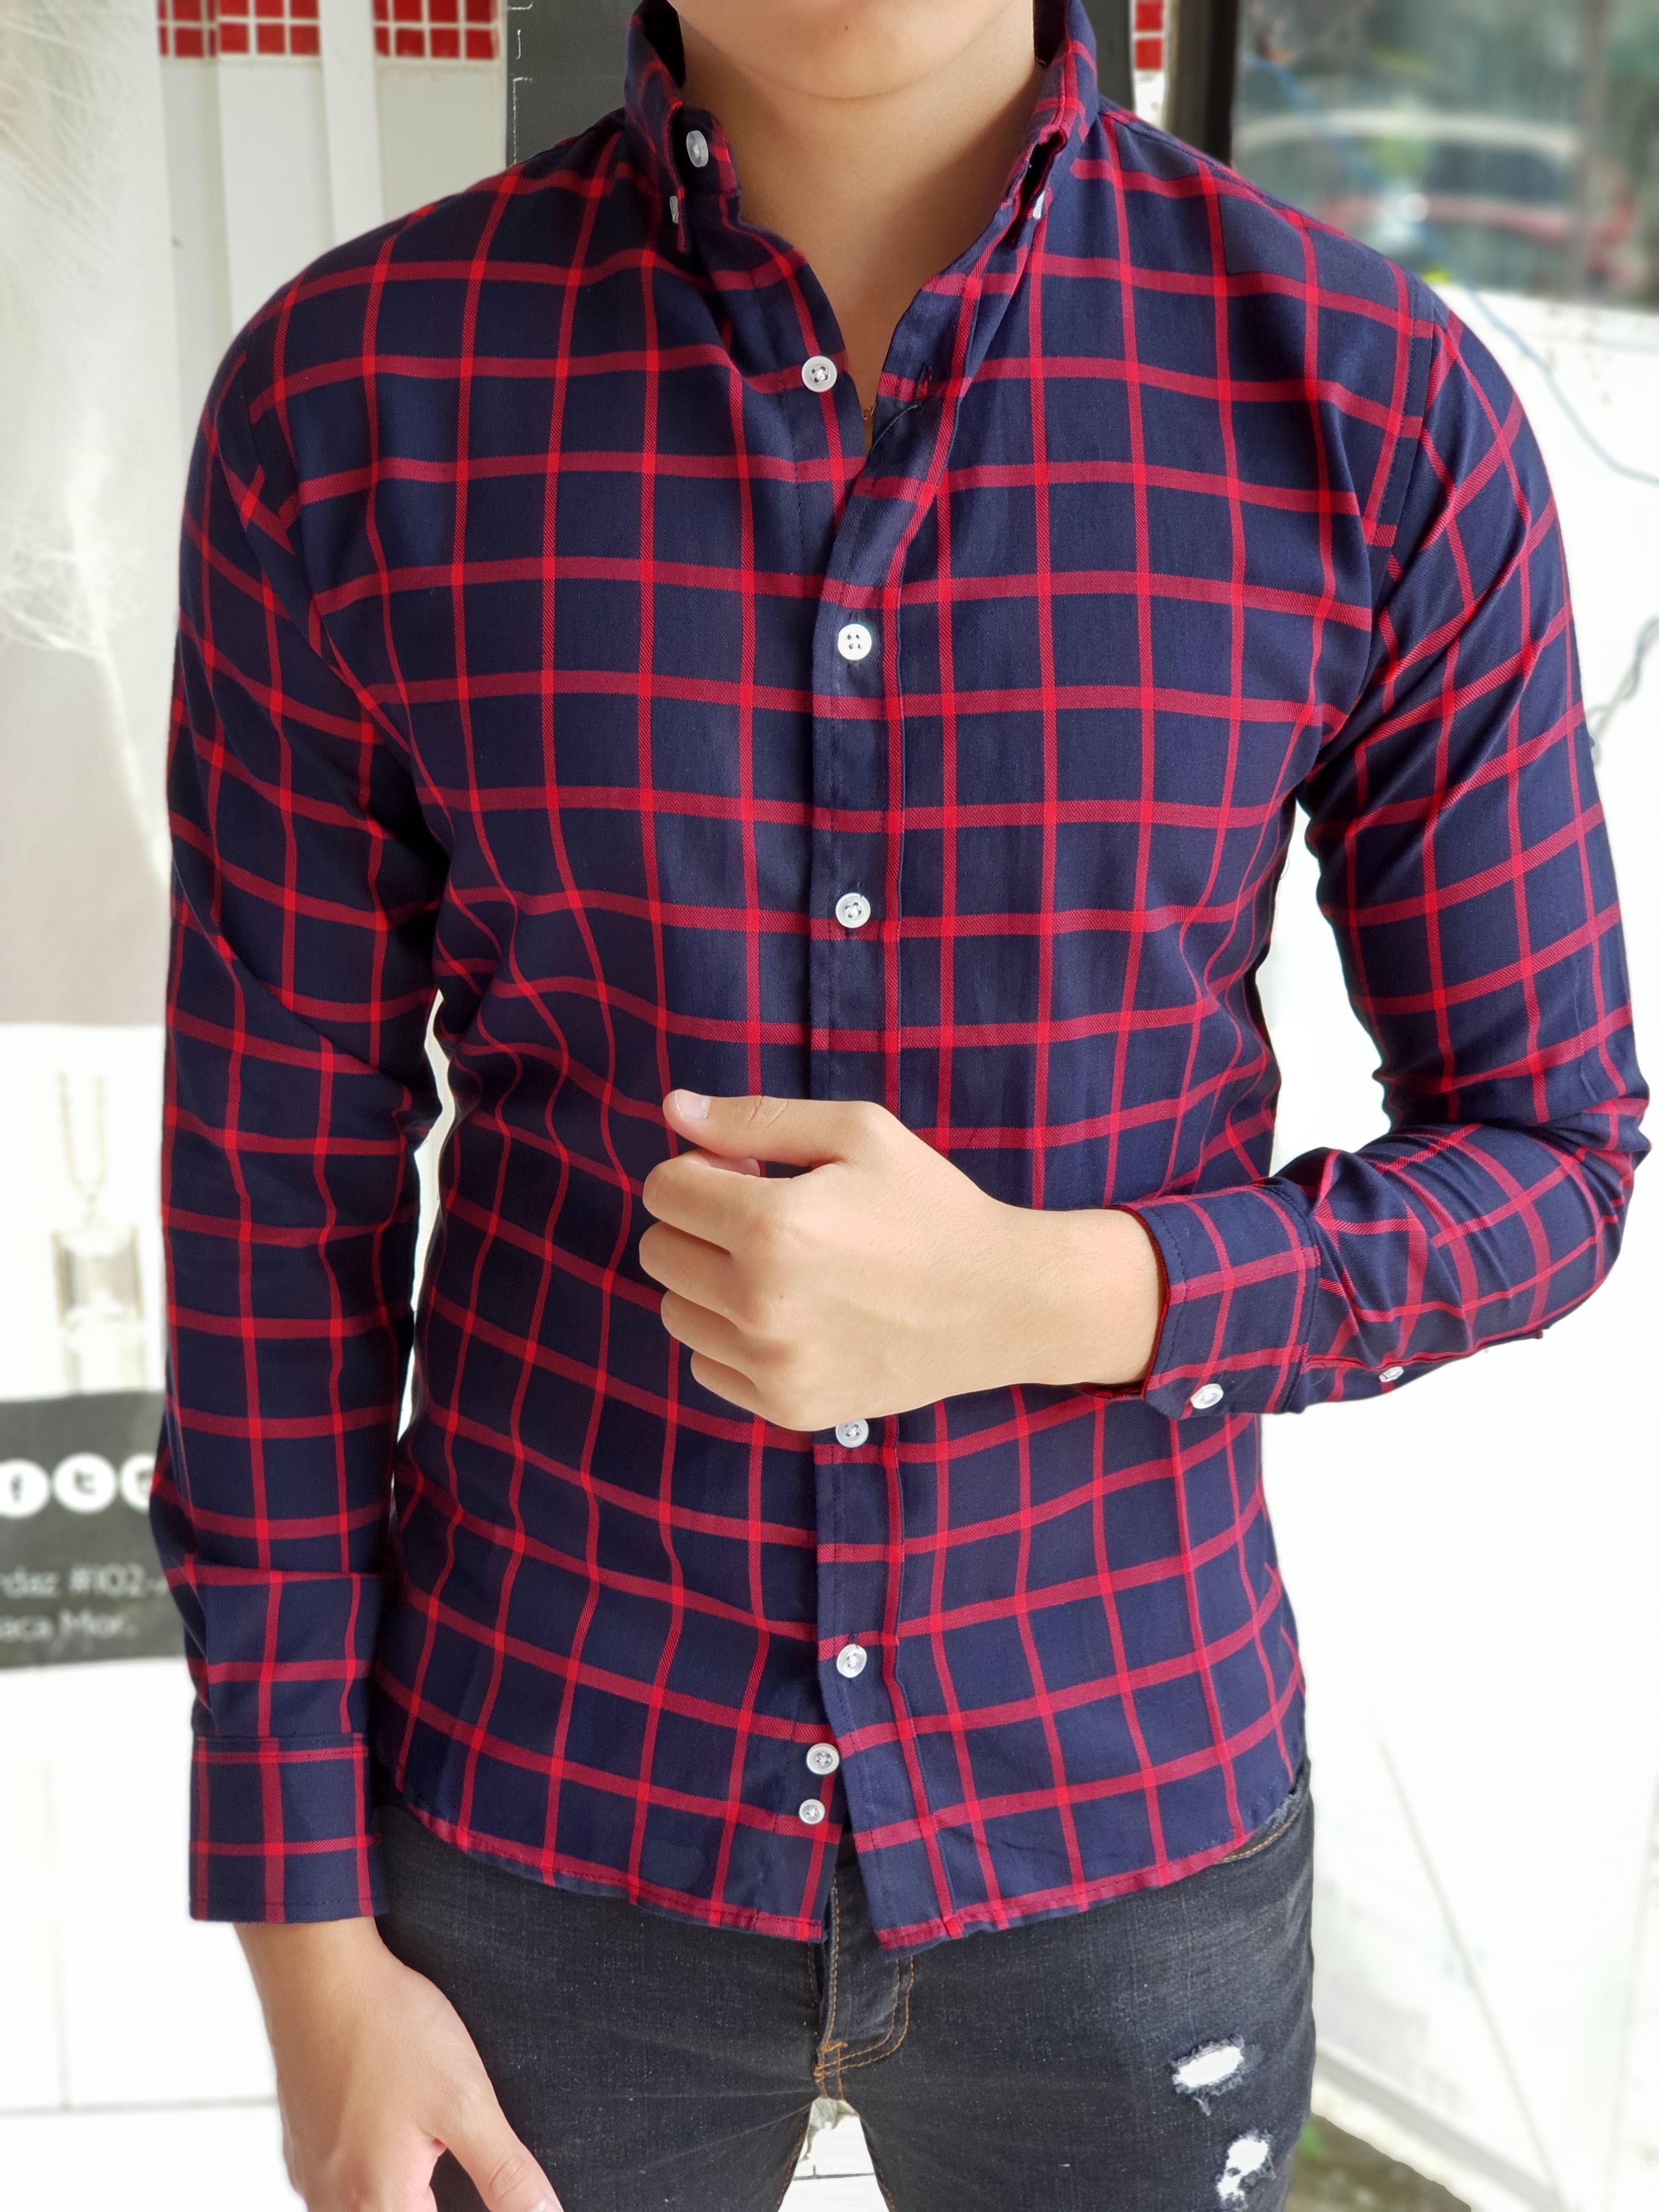 Outfit para hombre  camisa marino con cuadros rojos en manga larga y jeans  de mezclilla  385589fbb99d1